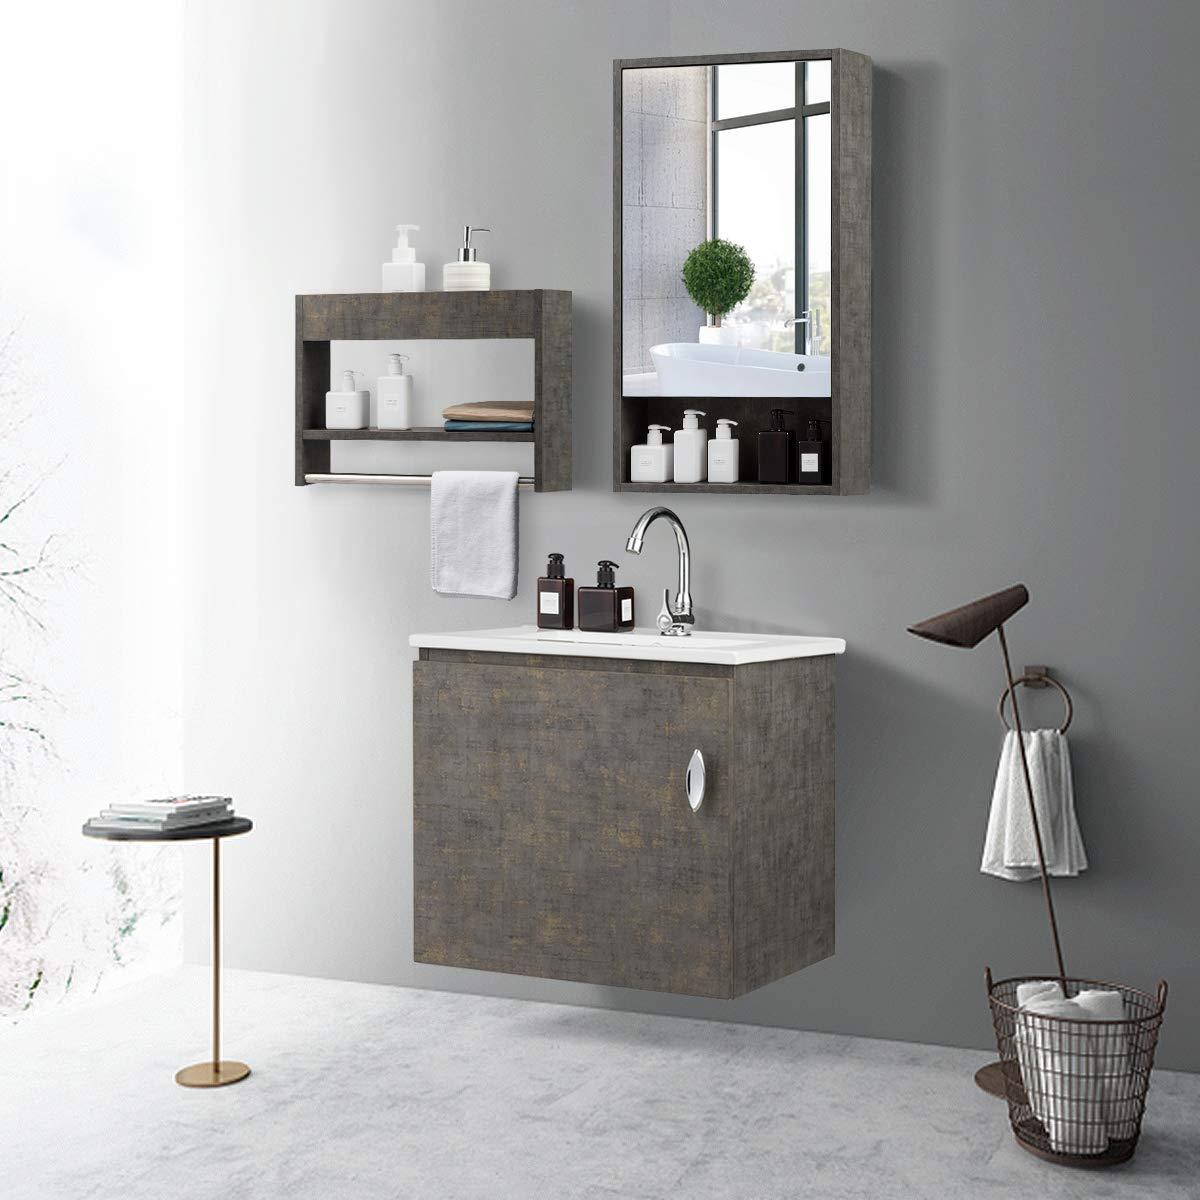 Tangkula Wall-Mounted Bathroom Vanity Set, Modern Bathroom ...